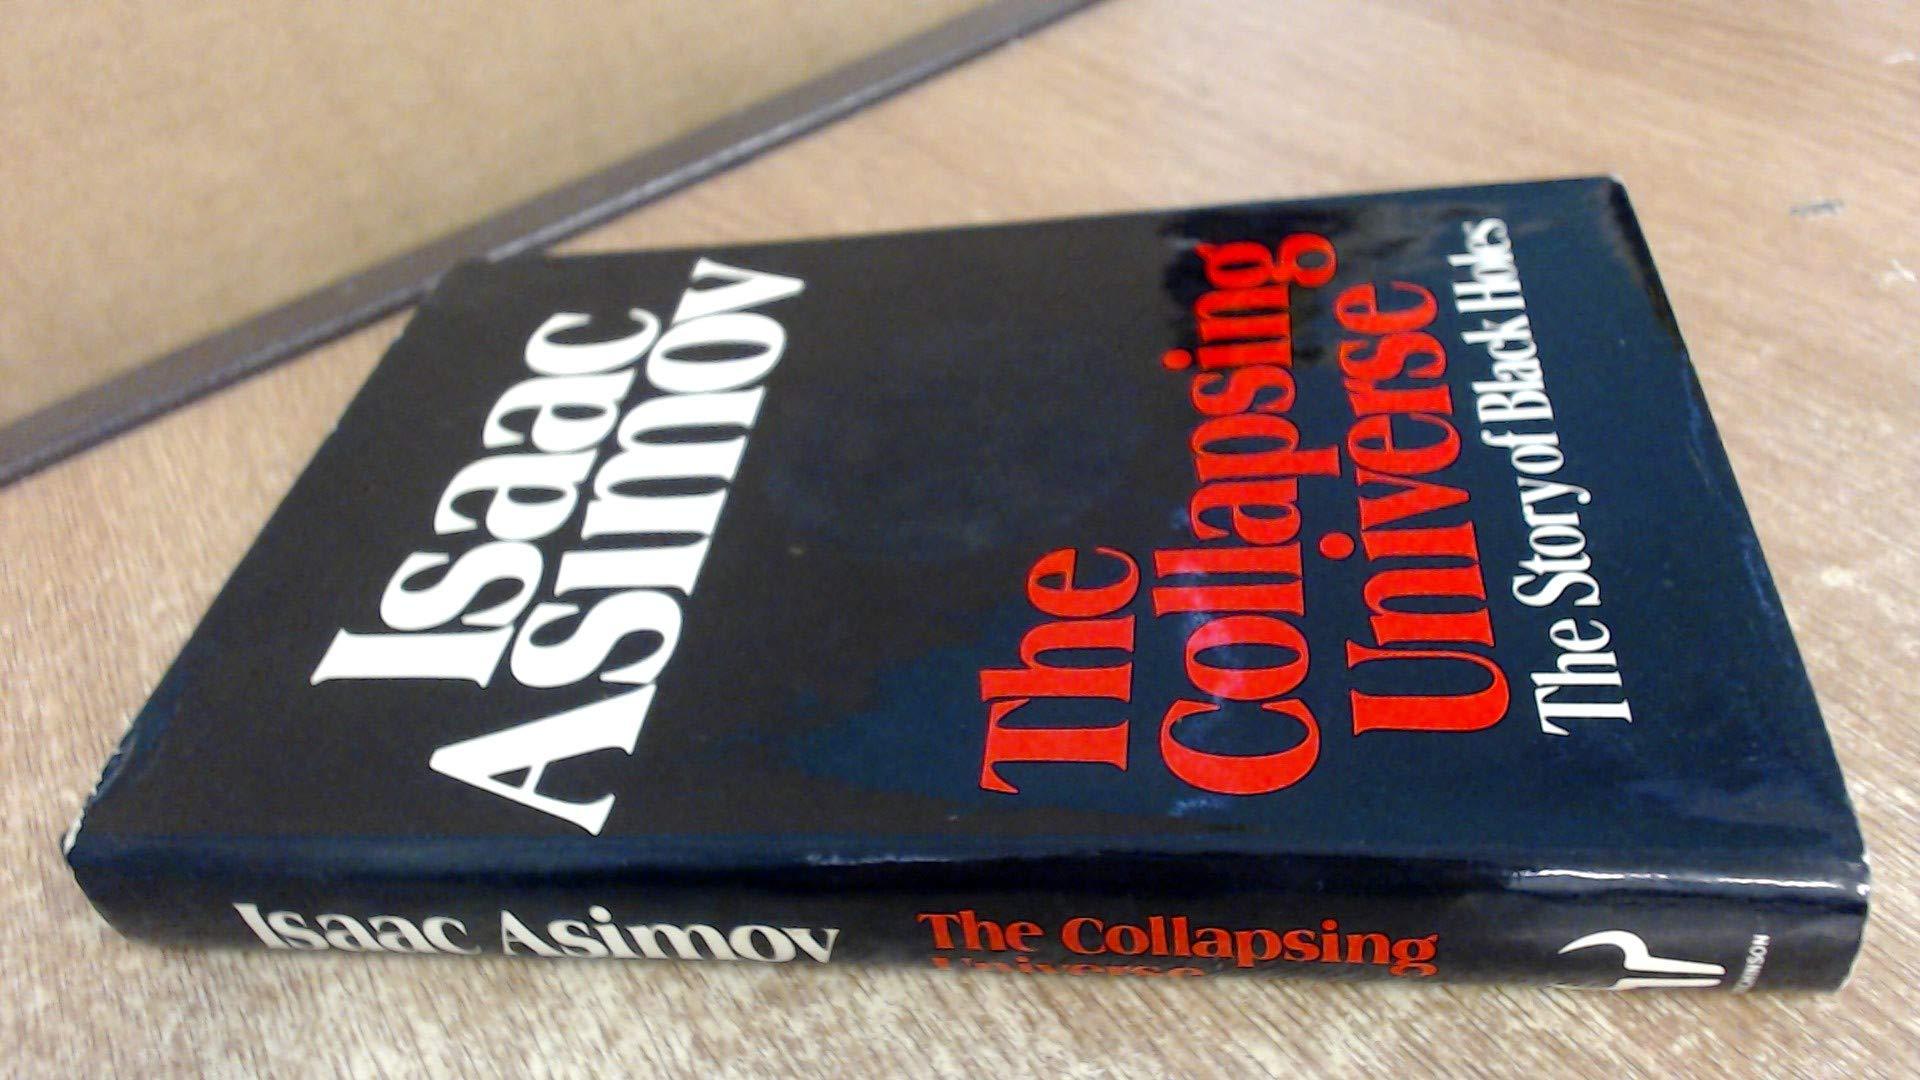 The Collapsing Universe: Story of Black Holes: Amazon.es: Isaac Asimov: Libros en idiomas extranjeros